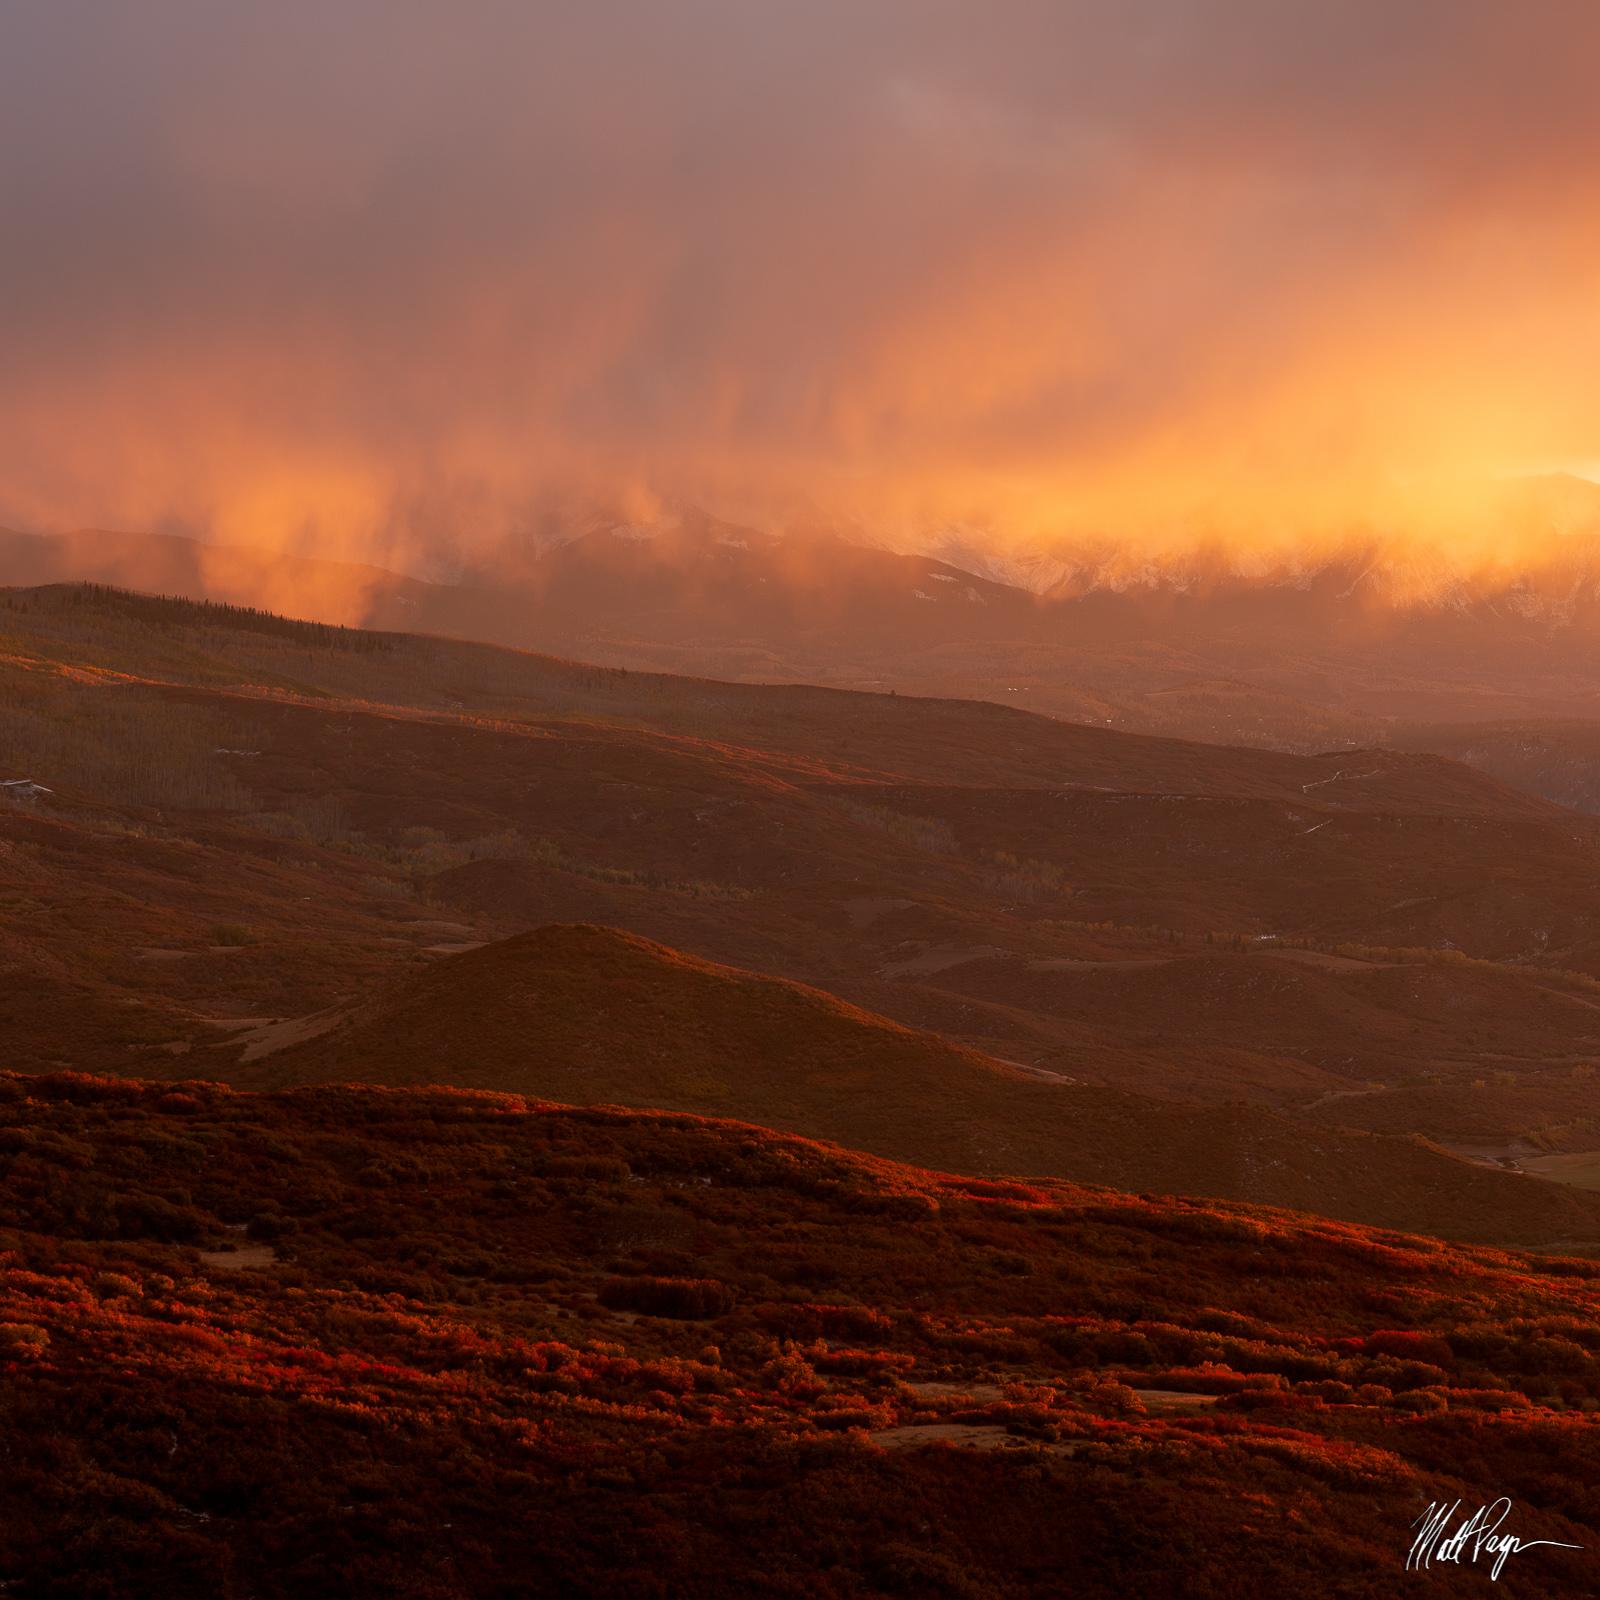 Autumn, Colorado, Dallas Divide, Ridgway, Sunset, cloud, scrub oak, storm, San Juan Mountains, photo